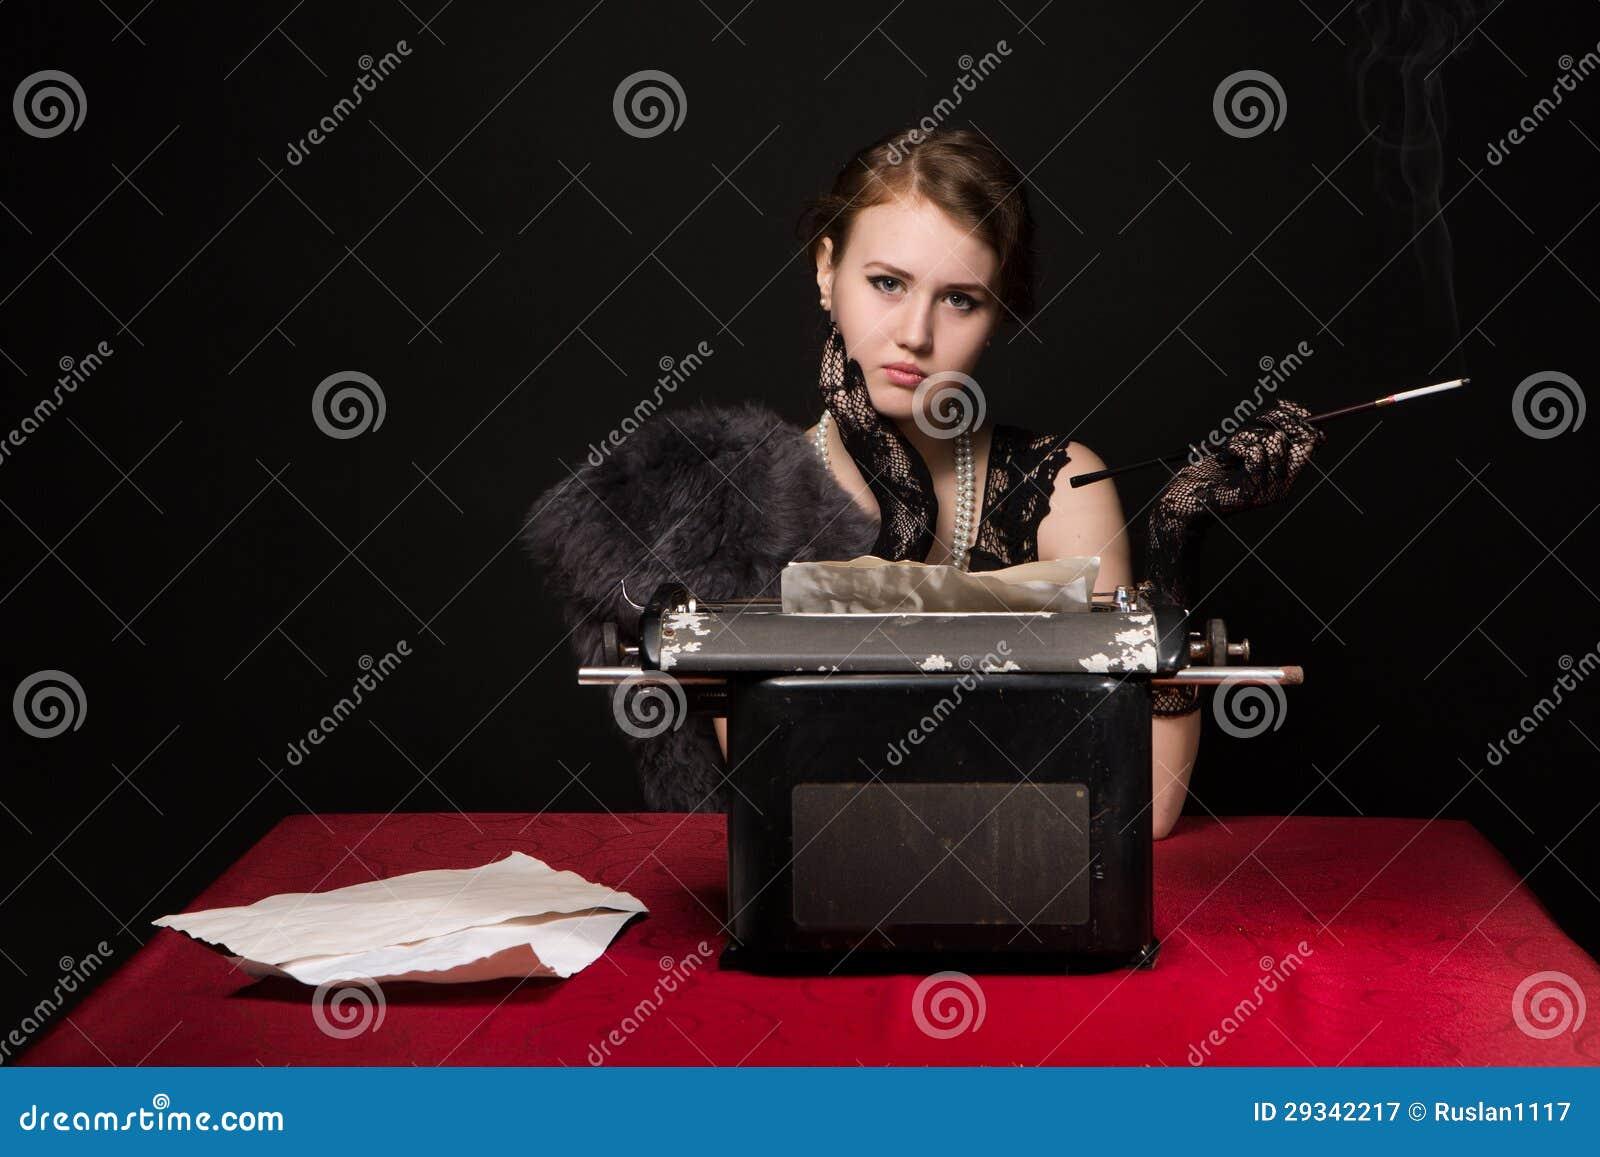 Noir девушка журналиста фильма